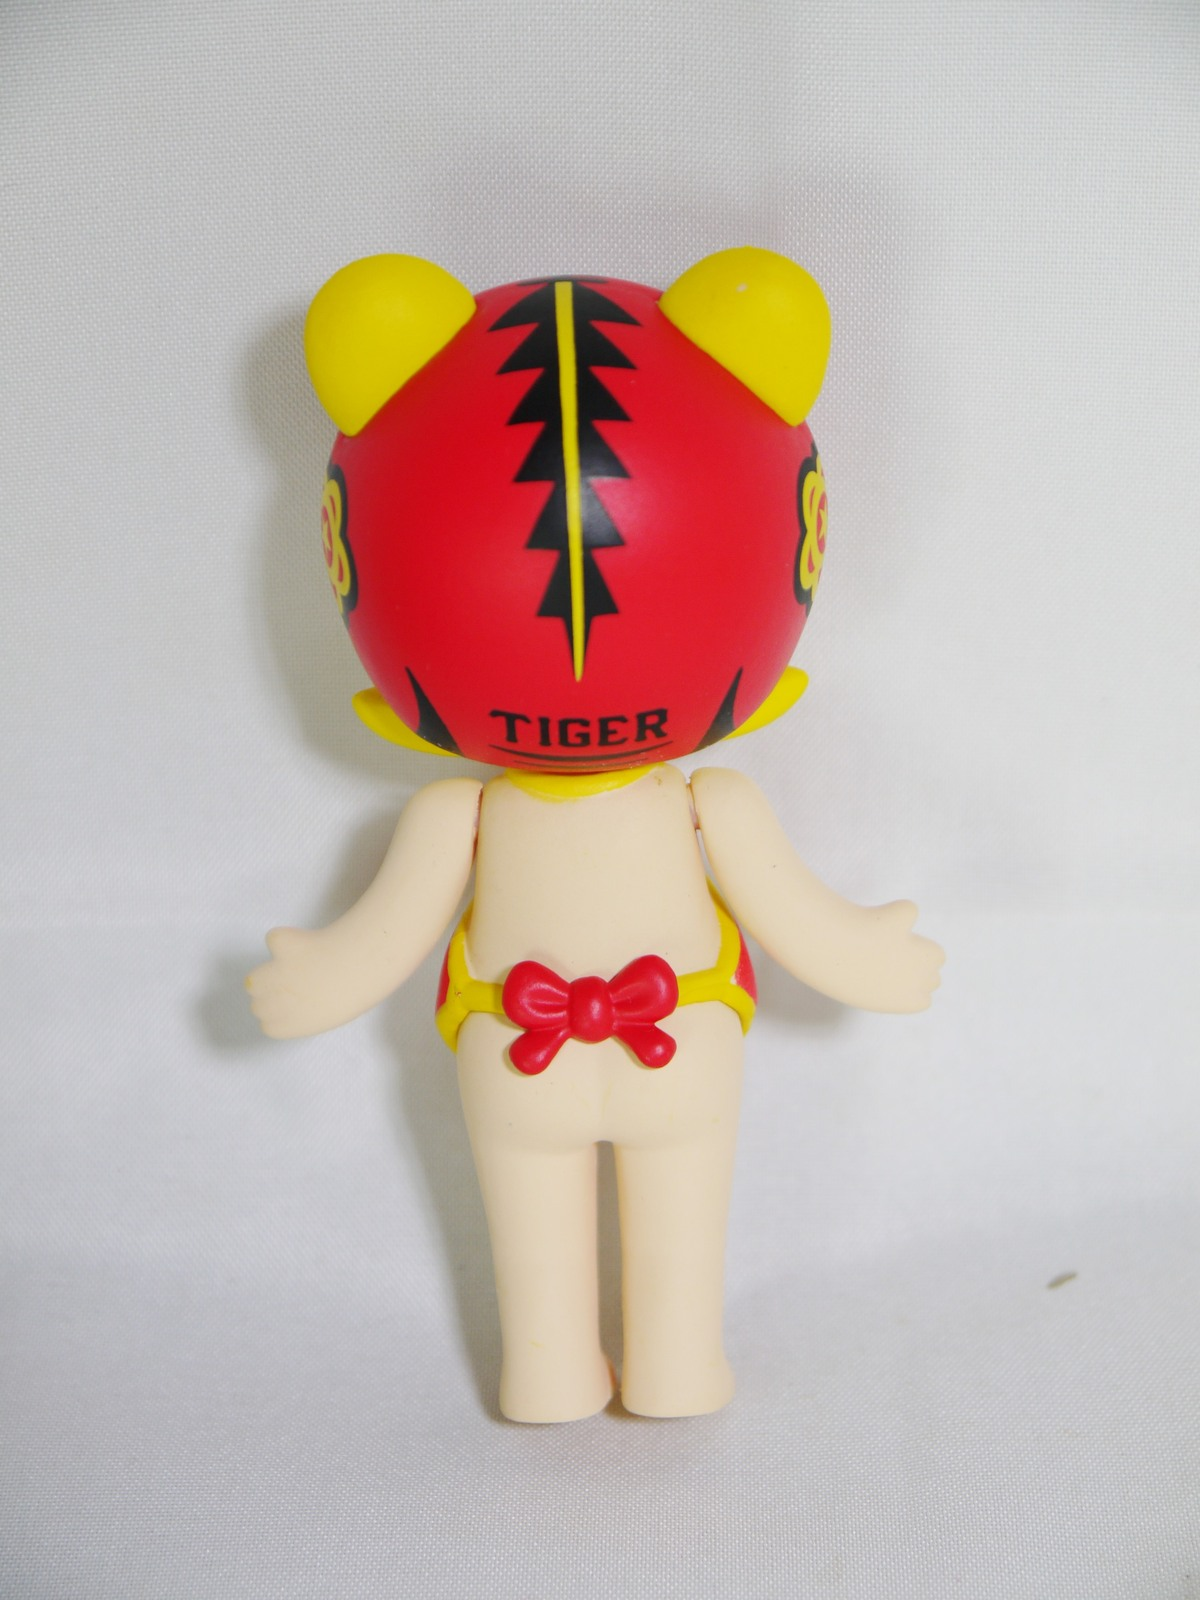 POP MART Kennyswork BLOCK Little Molly Chinese Zodiac Tiger Folk Art Cloth Tiger